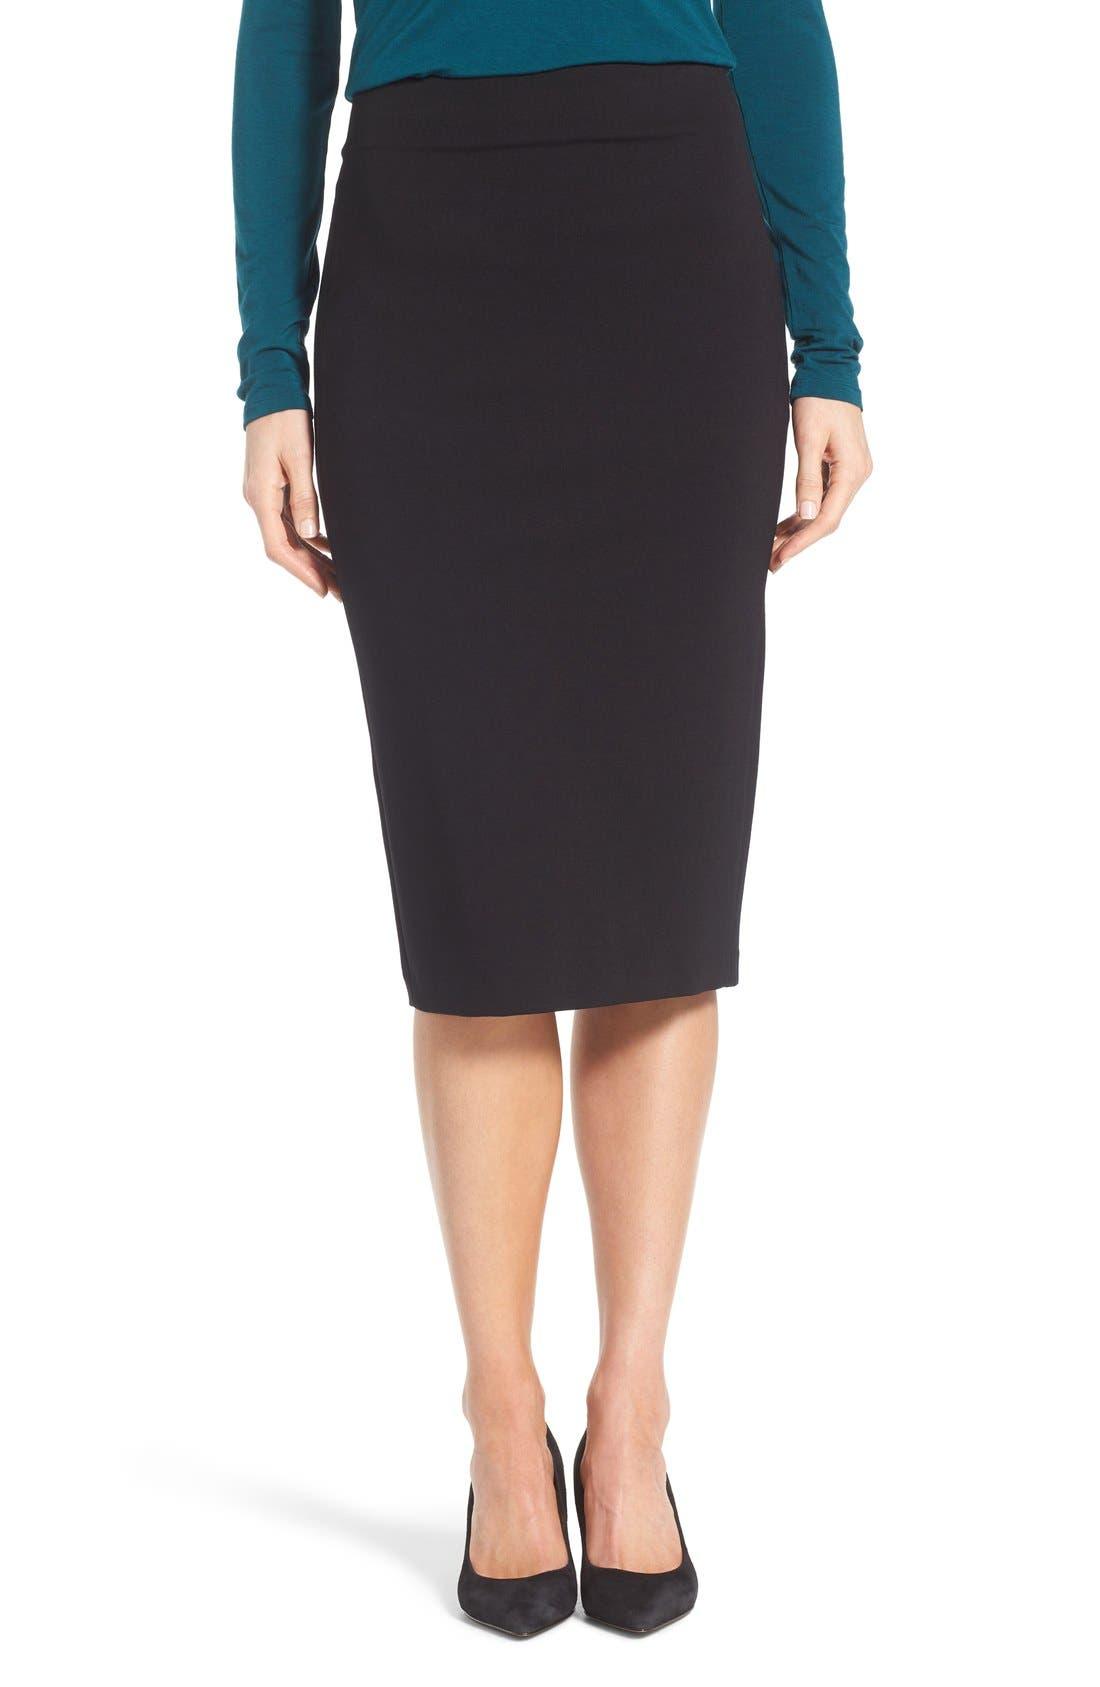 Petite Vince Camuto Ponte Midi Skirt, Black